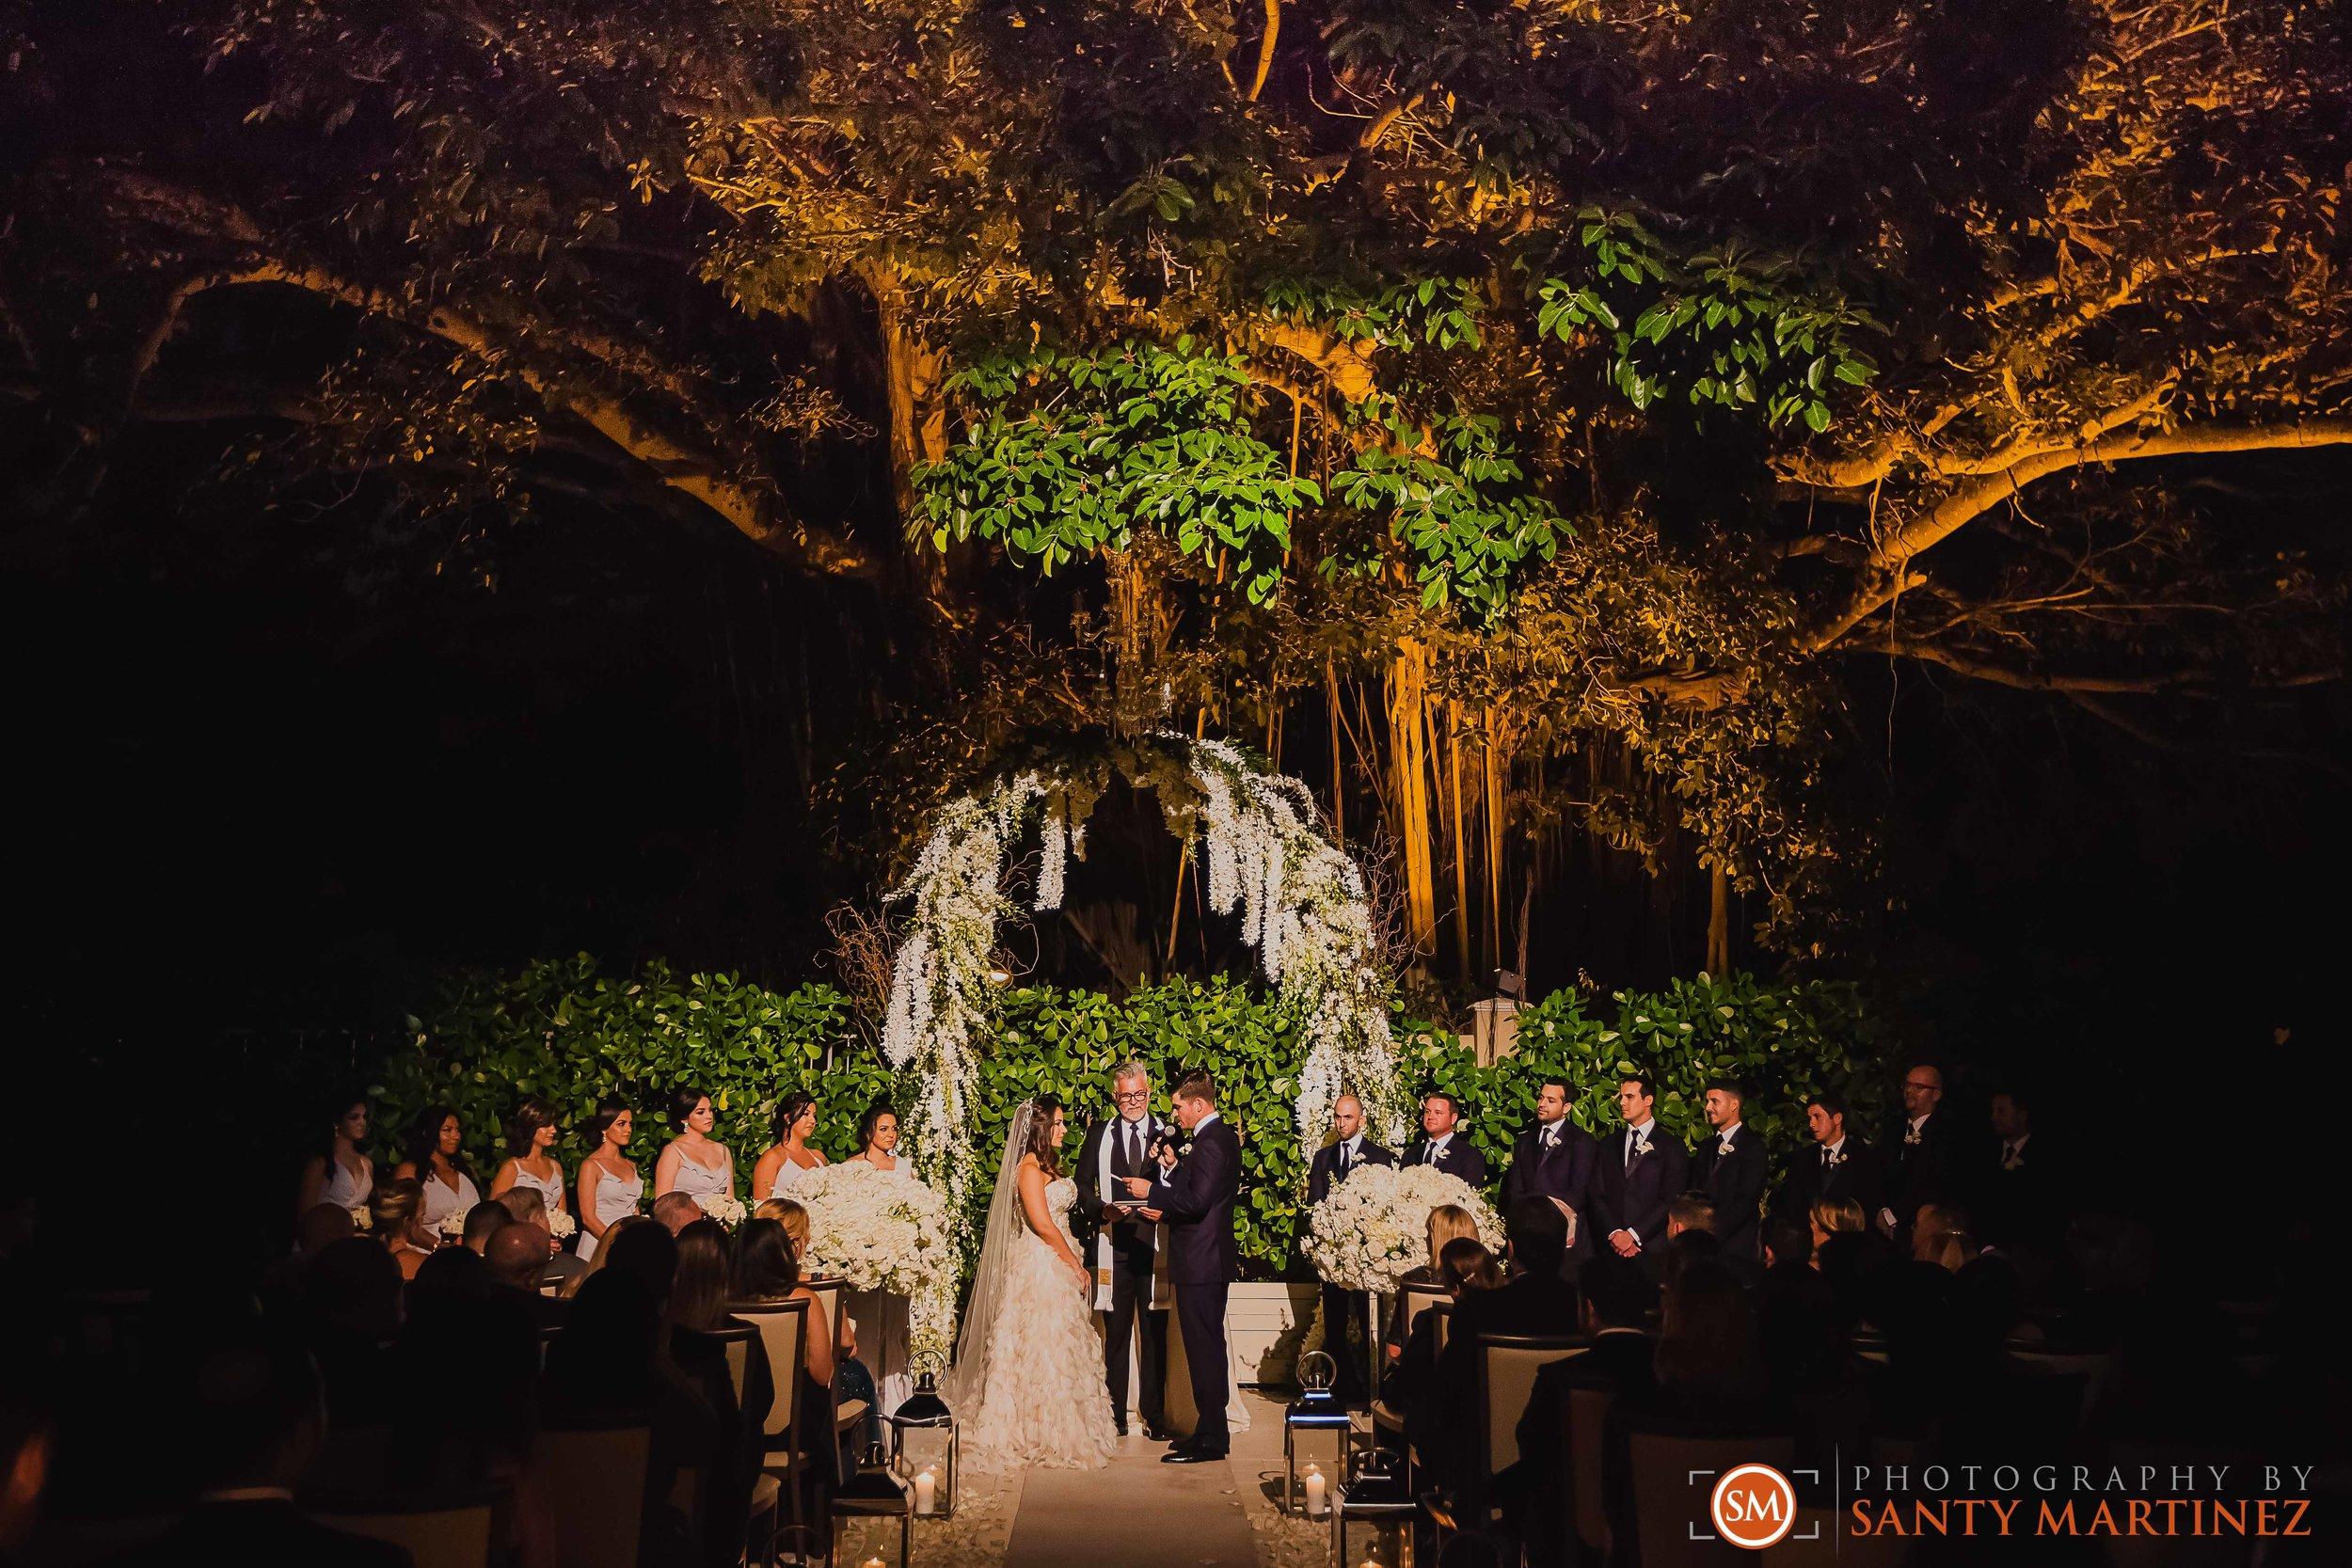 Wedding Coral Gables Country Club - Santy Martinez Photography-26.jpg